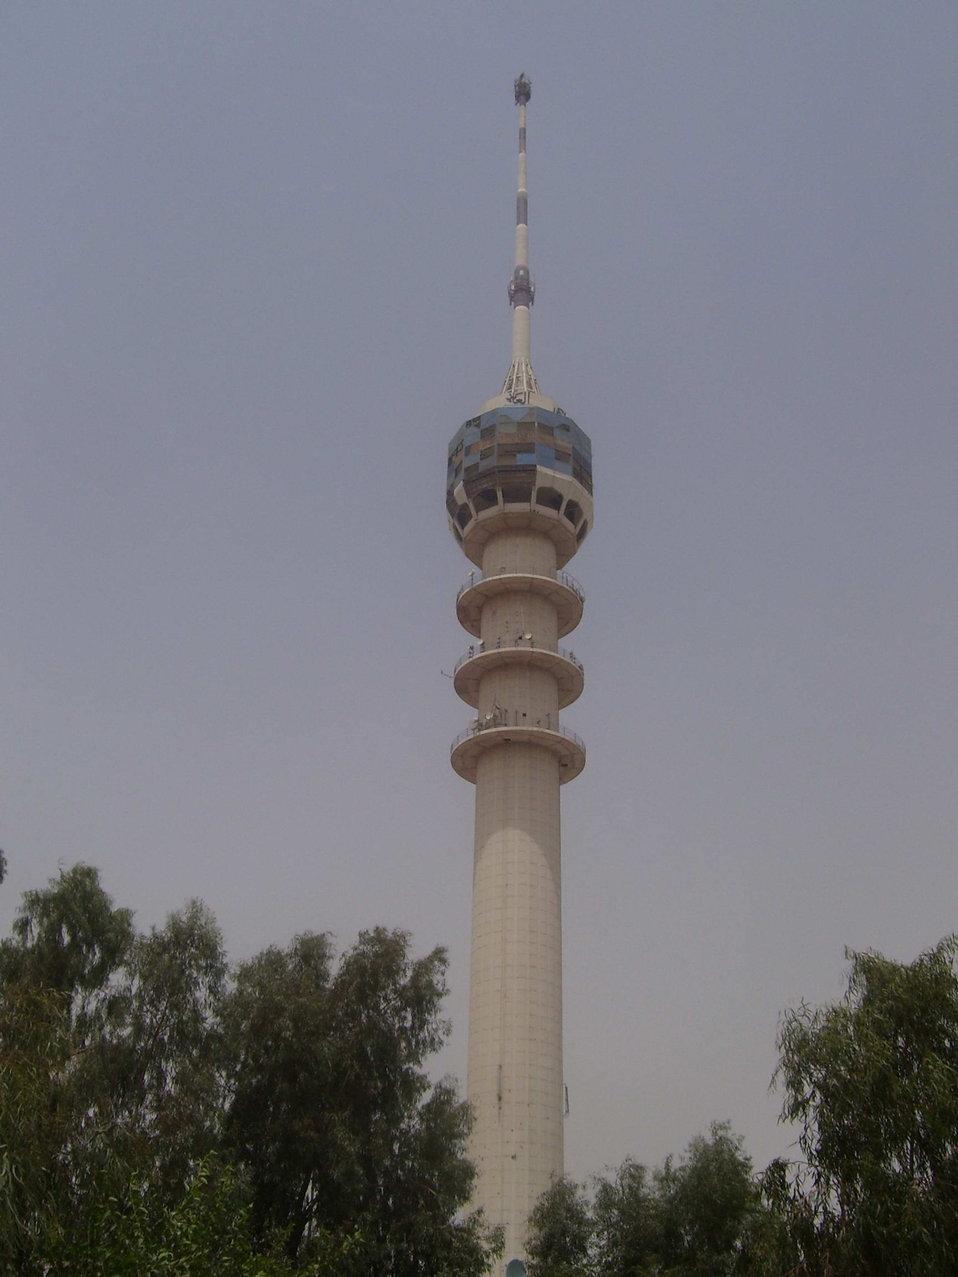 Baghdad Tower Deutsch:  Fernsehturm Bagdad